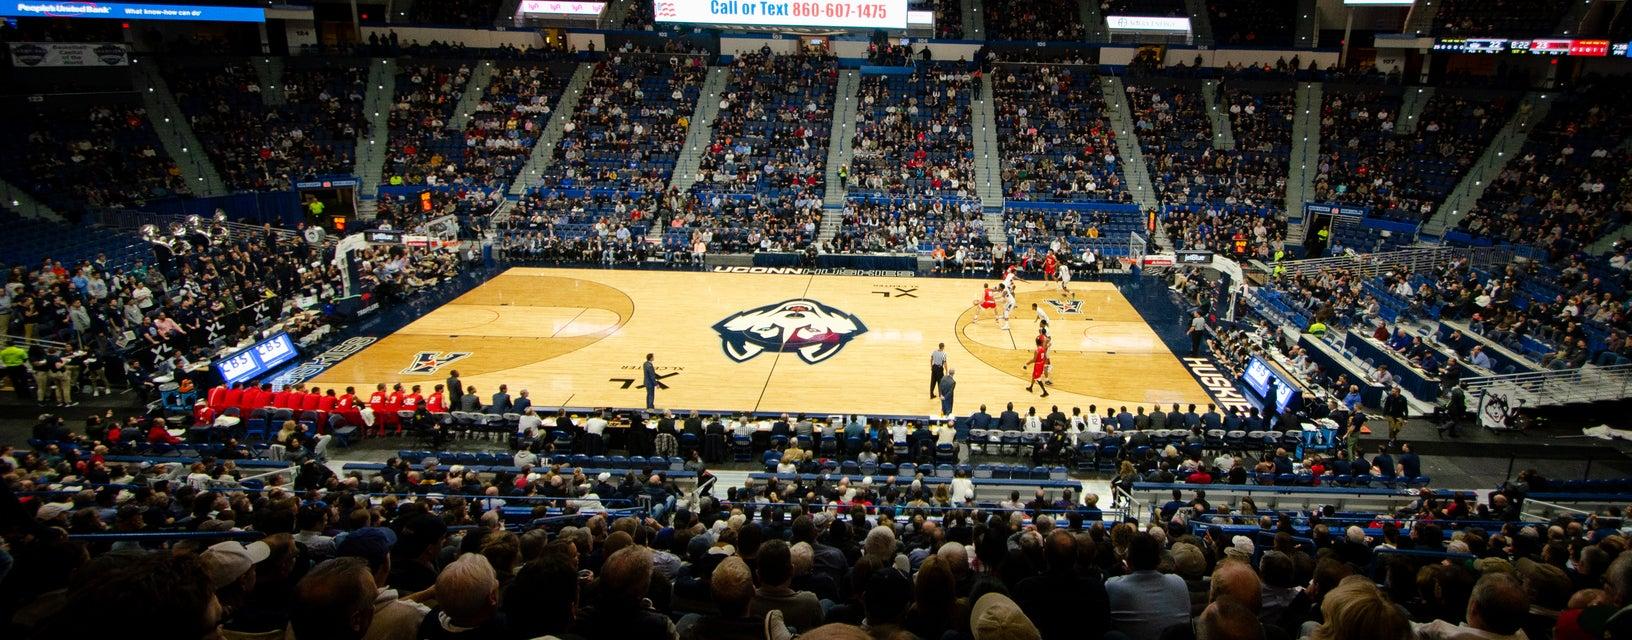 UCONN Mens Basketball Tickets